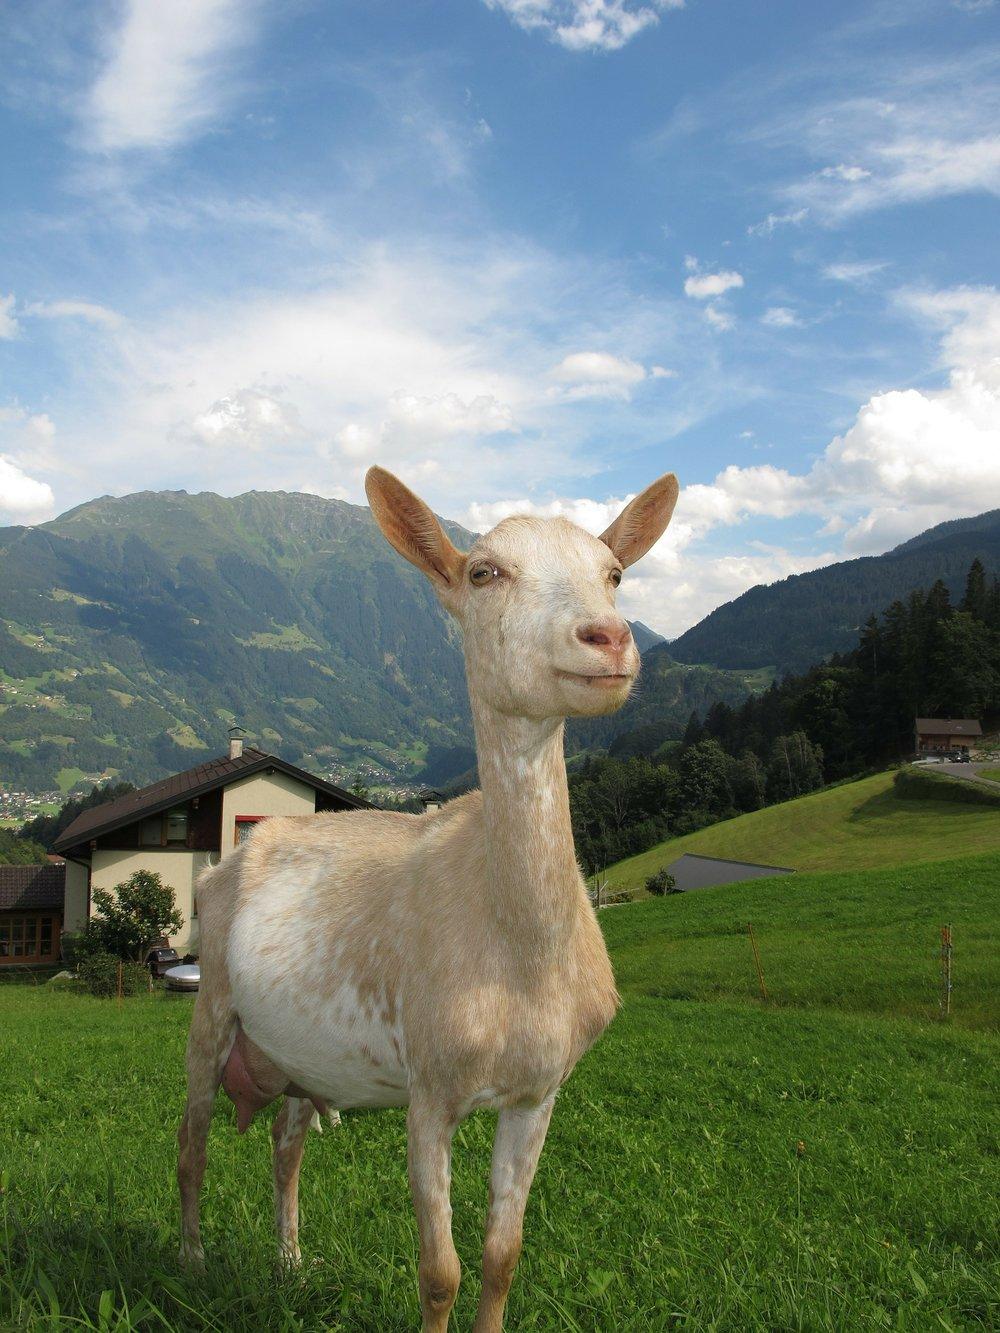 goat-in-austria-198455_1920.jpg